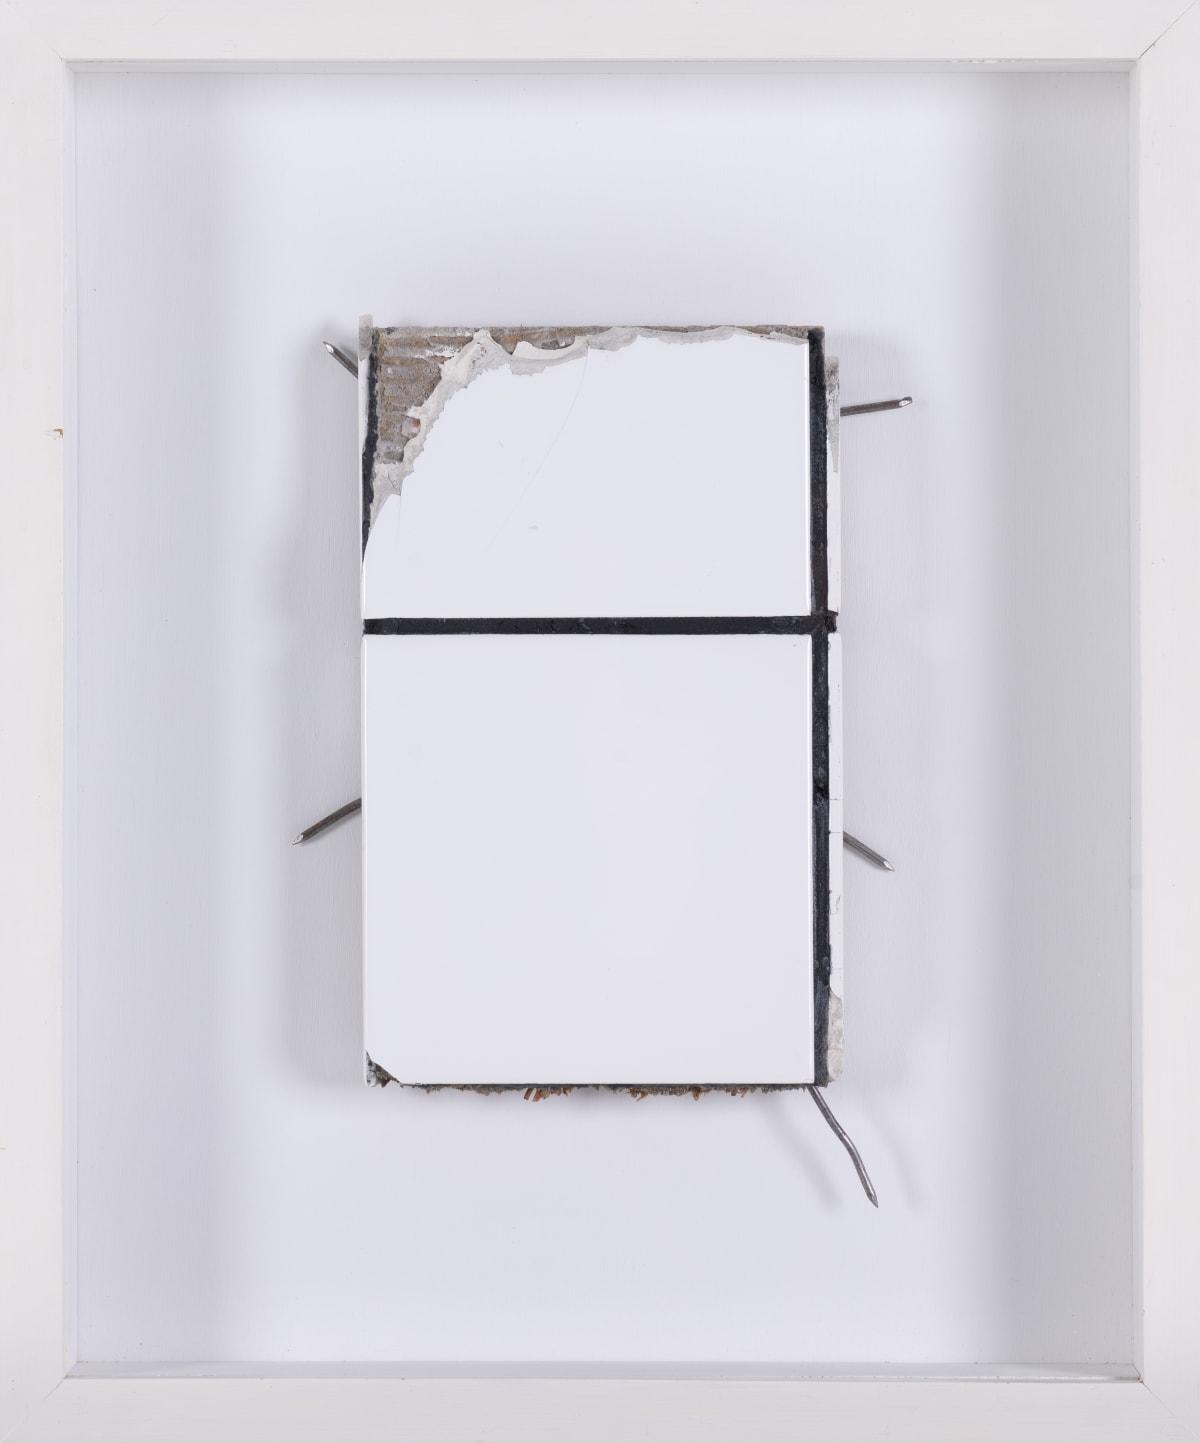 Jean-Pierre RAYNAUD , Fragment de Menil,, 1984